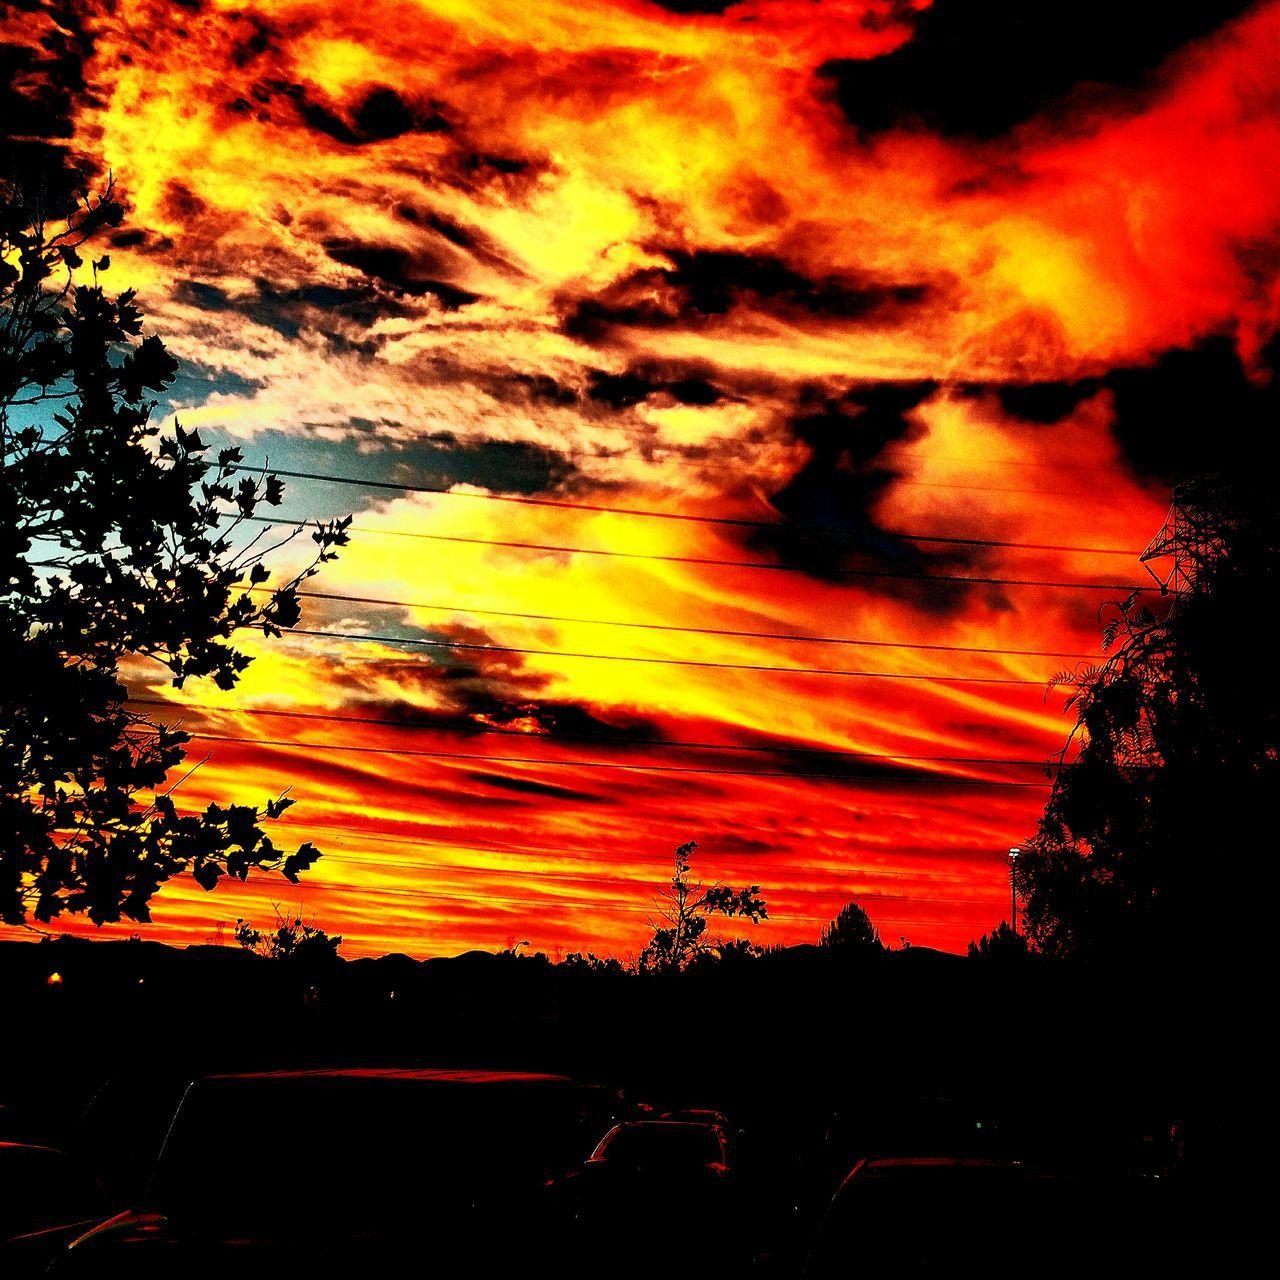 sunset, silhouette, sky, car, tree, orange color, dramatic sky, nature, cloud - sky, no people, beauty in nature, scenics, outdoors